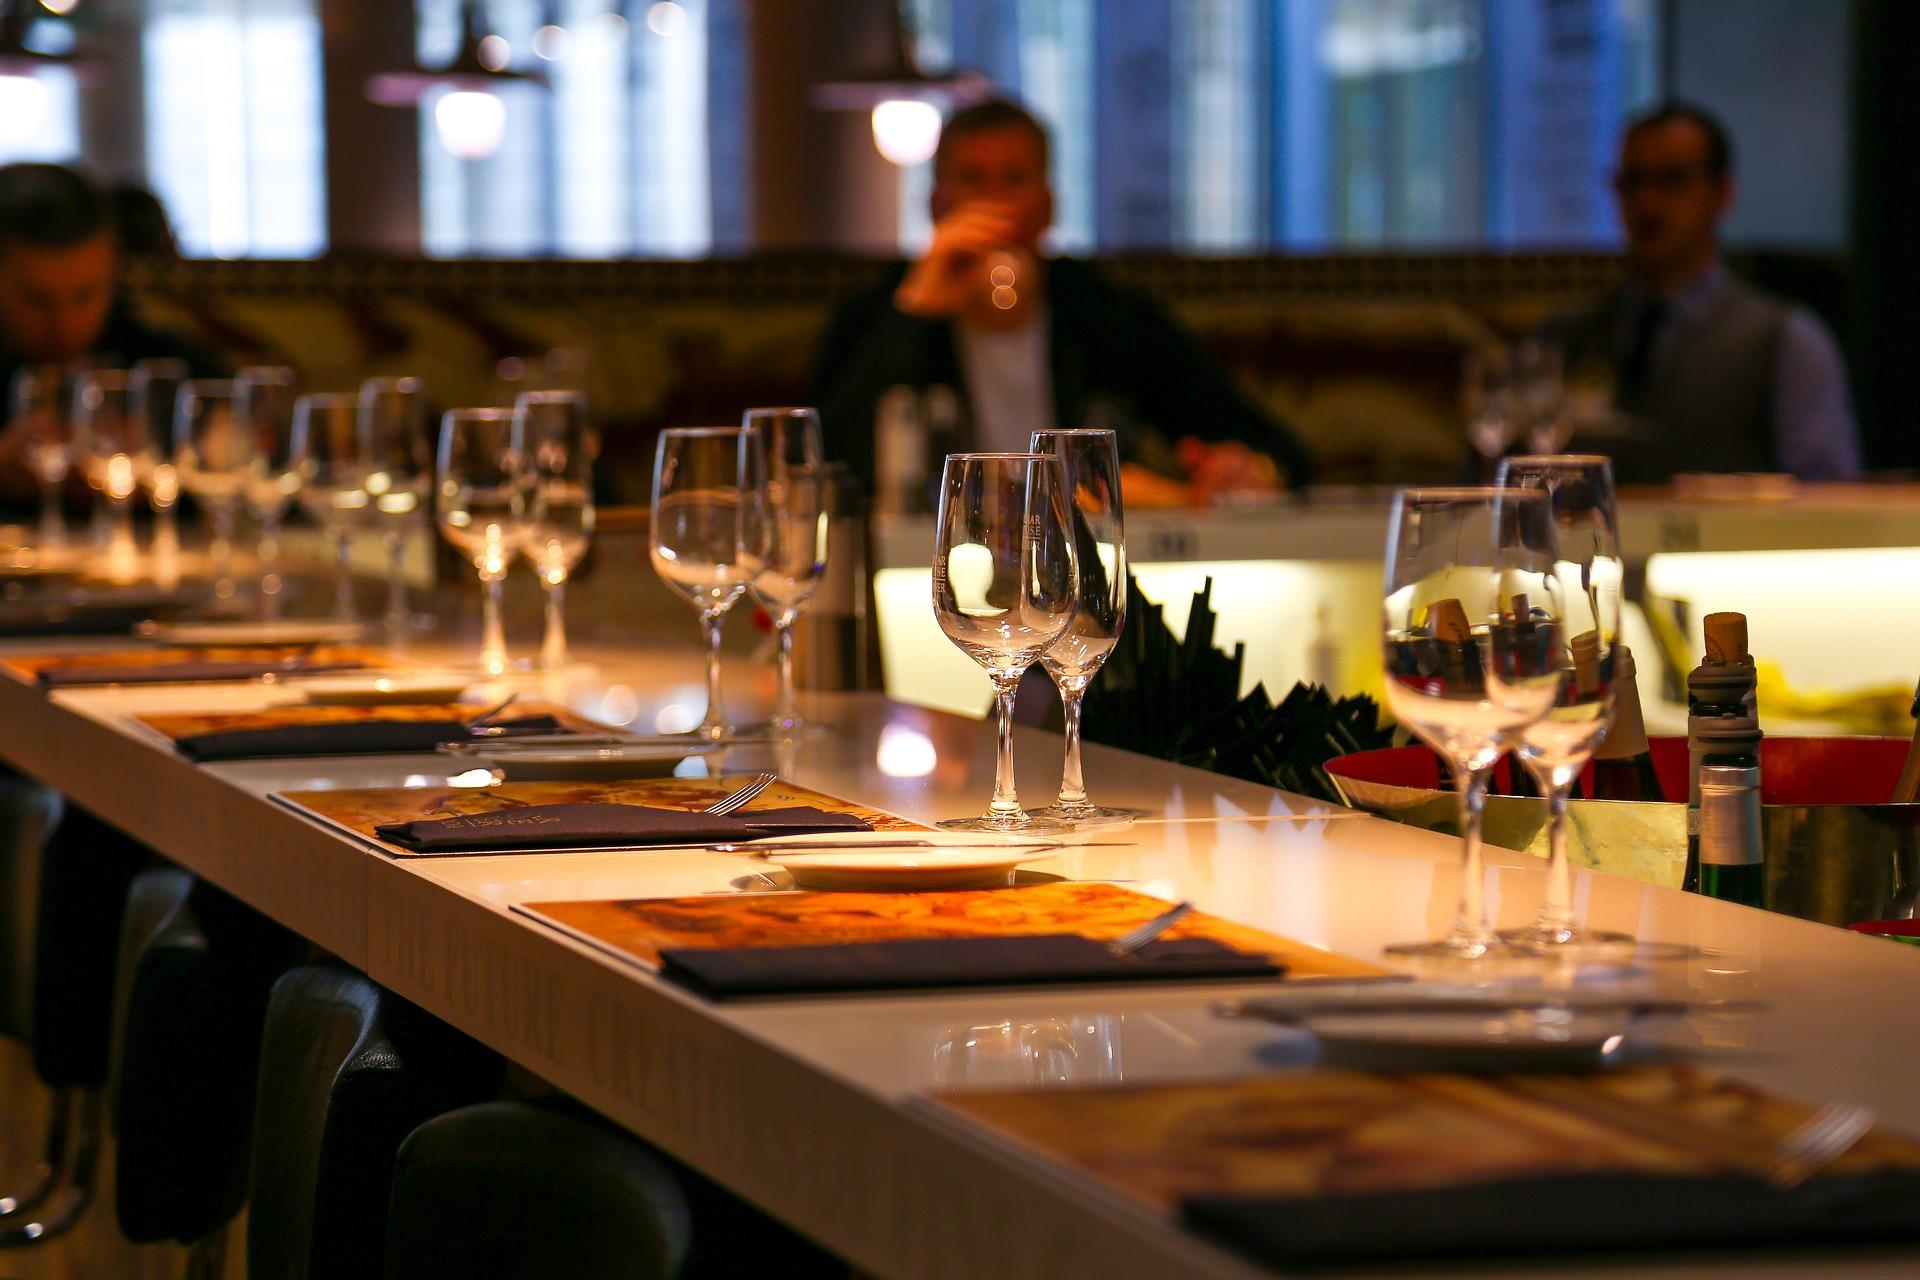 Best-Restaurants-for-Groups-in-America